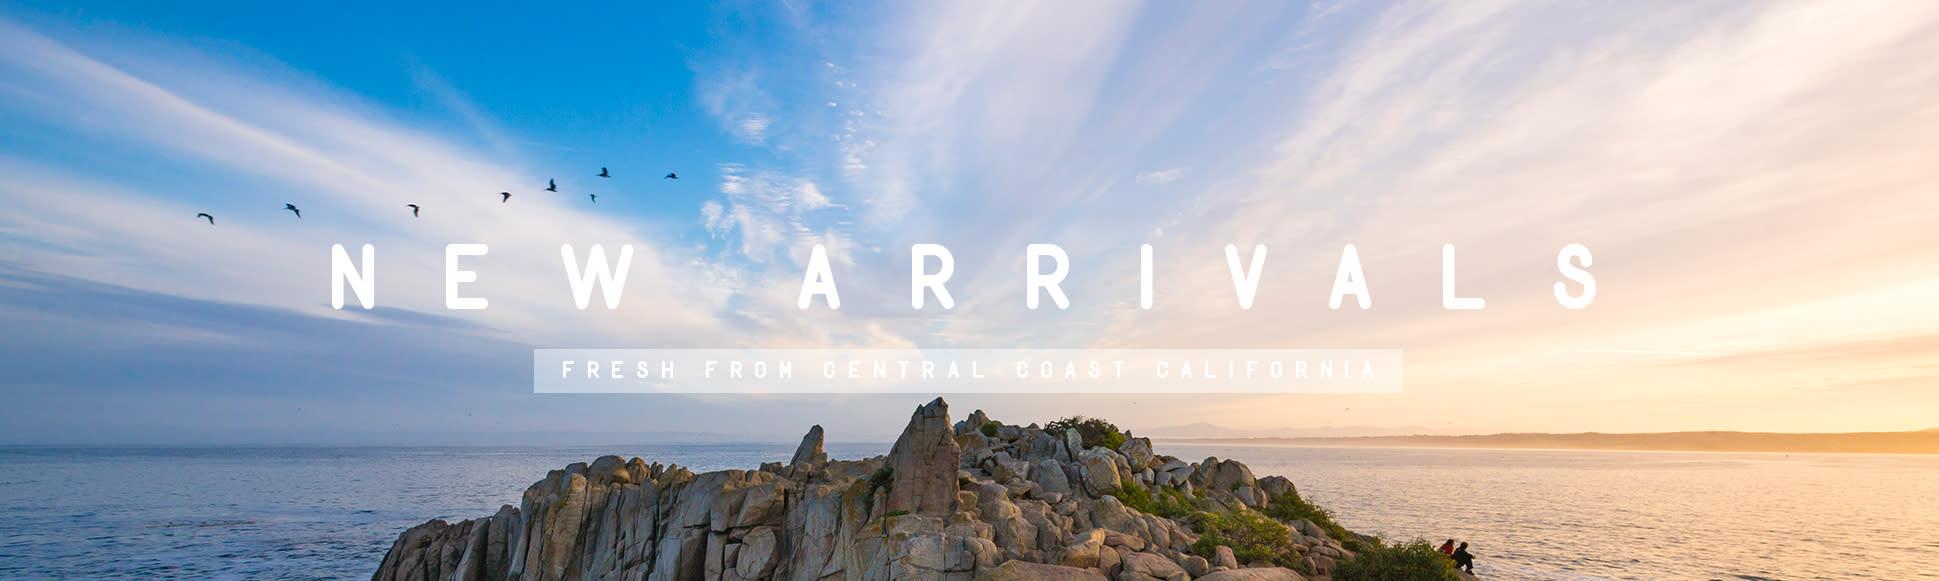 <div class='title'>           loa banner new arrivals sfw         </div>                 <div class='description'>           New Arrivals Central Coast Cali         </div>